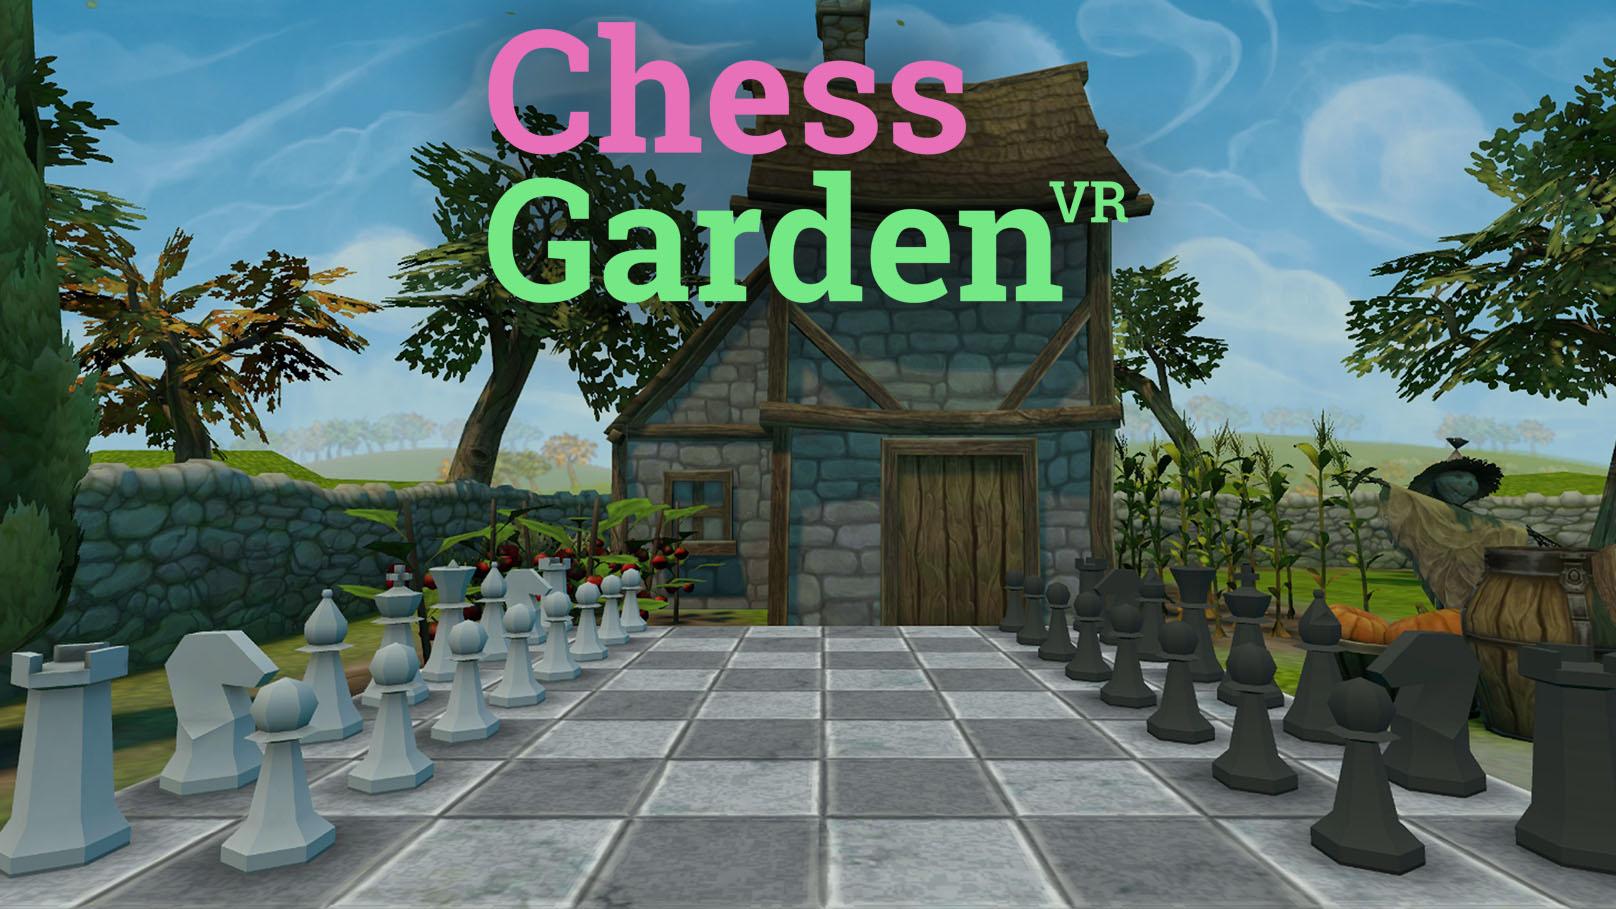 Chess Garden VR